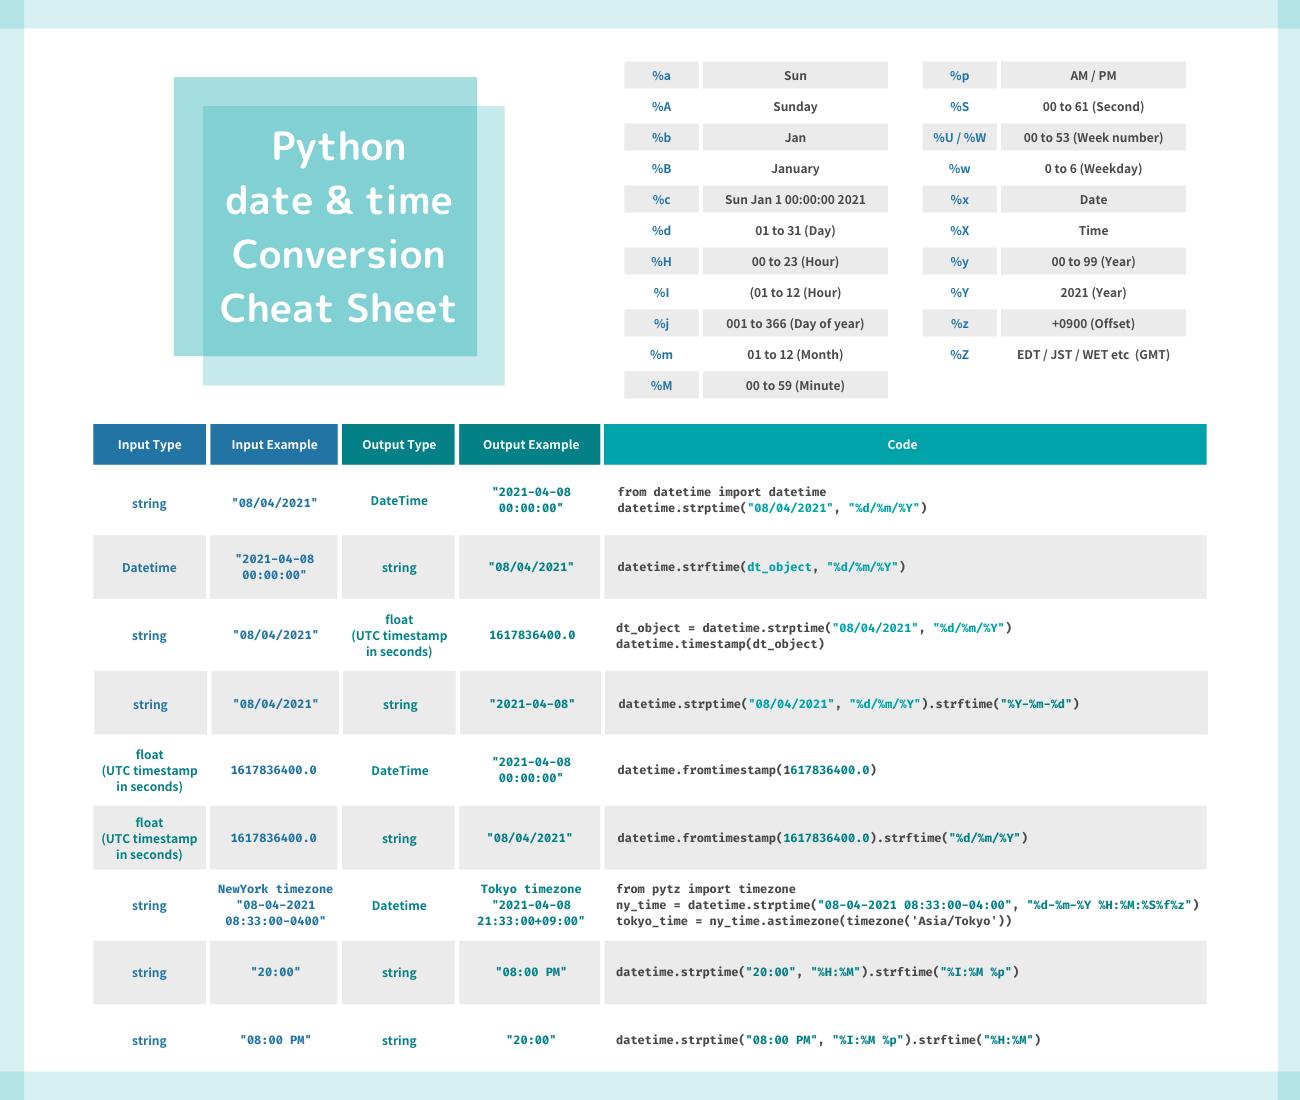 Python date & time conversion CheatSheet